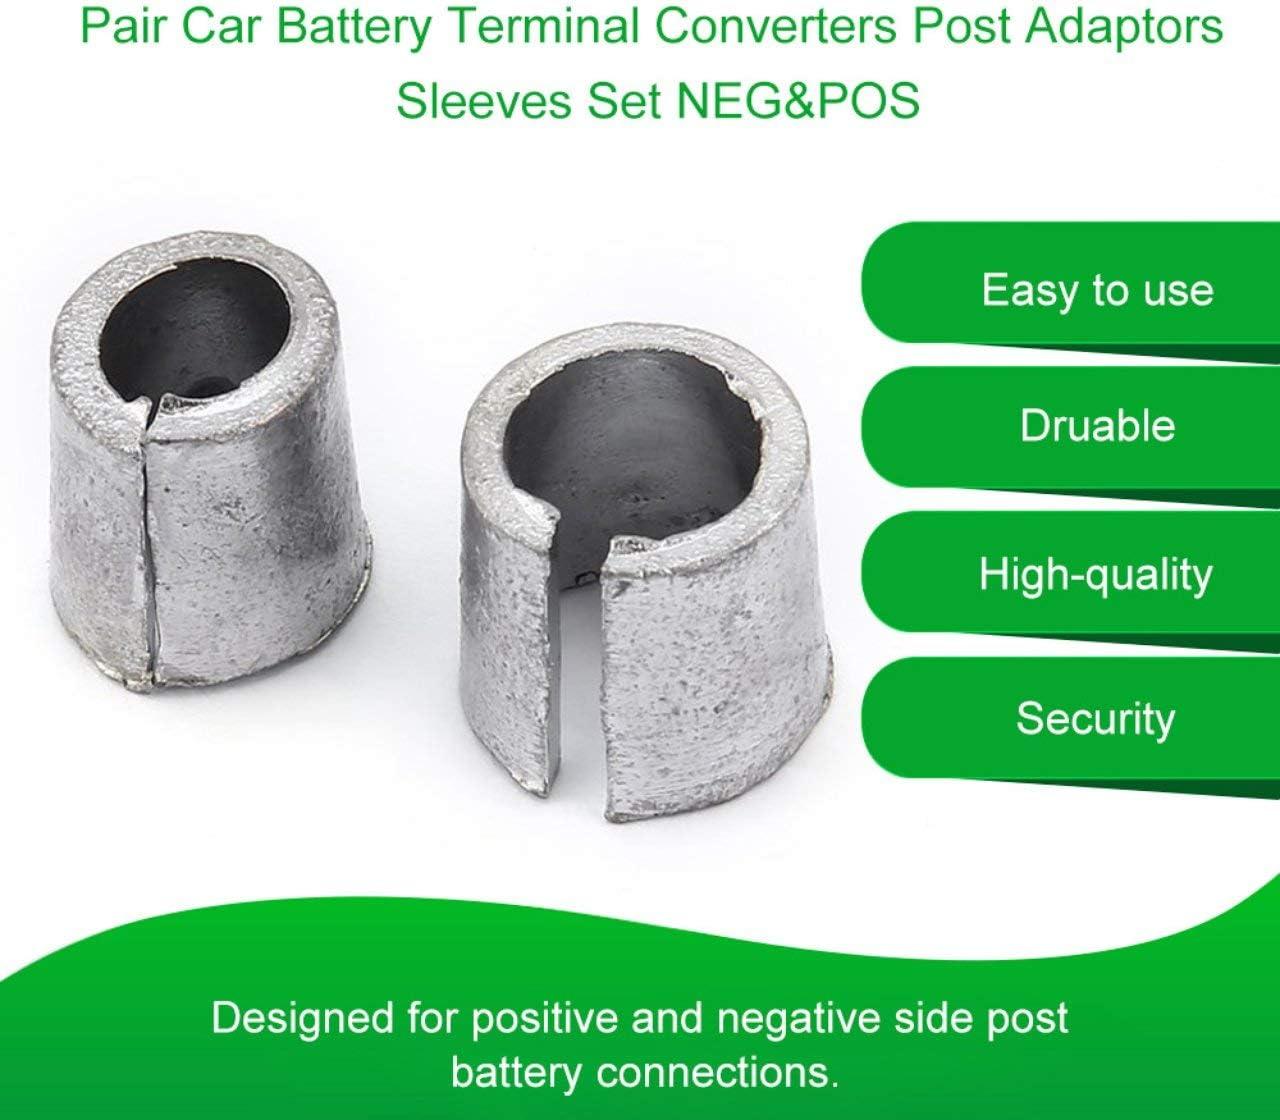 Pair Car Battery Terminal Converters Post Adaptors Sleeves Set Battery Post Adapters Sleeves 1 x NEG /& 1 x POS silver Jasnyfall